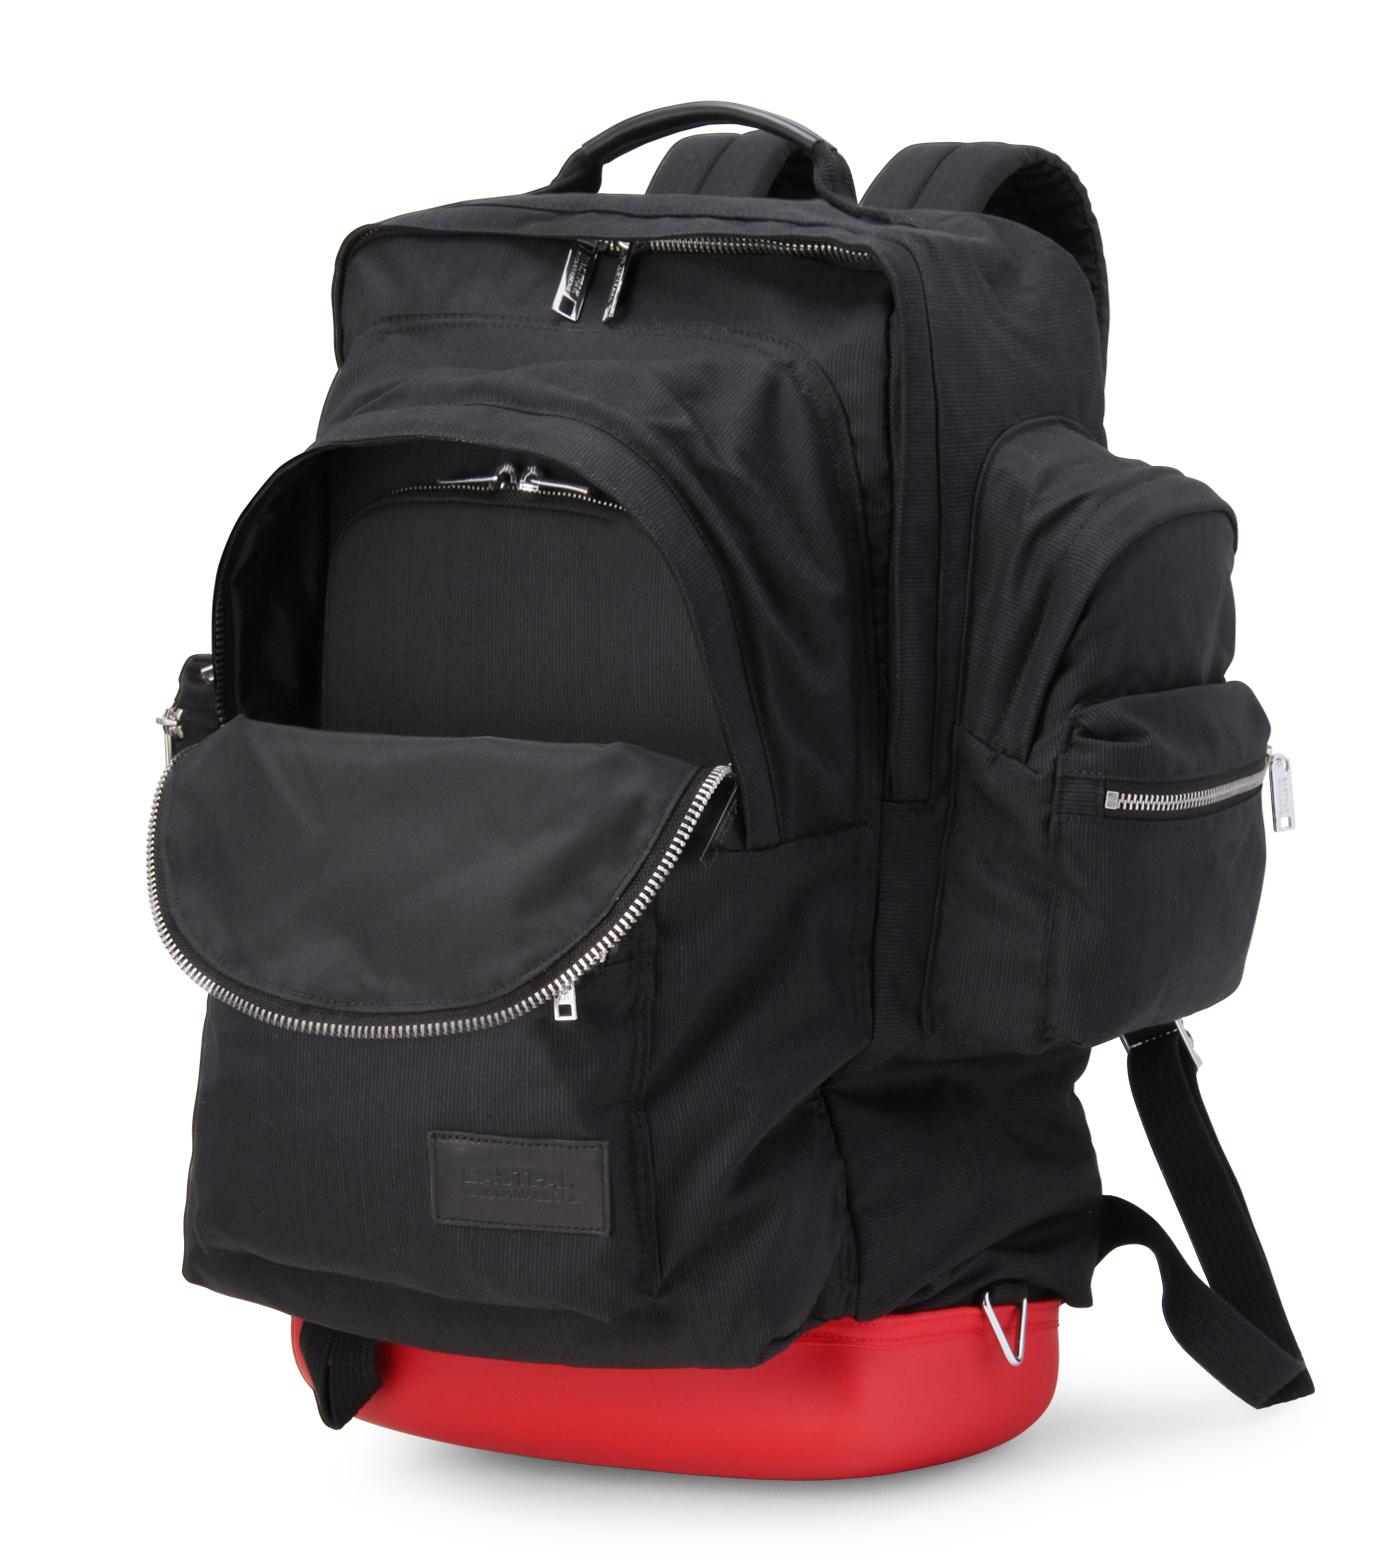 Kris Van Assche +(クリスヴァンアッシュ プラス)のBack pack-BLACK-131EK875-13 拡大詳細画像4